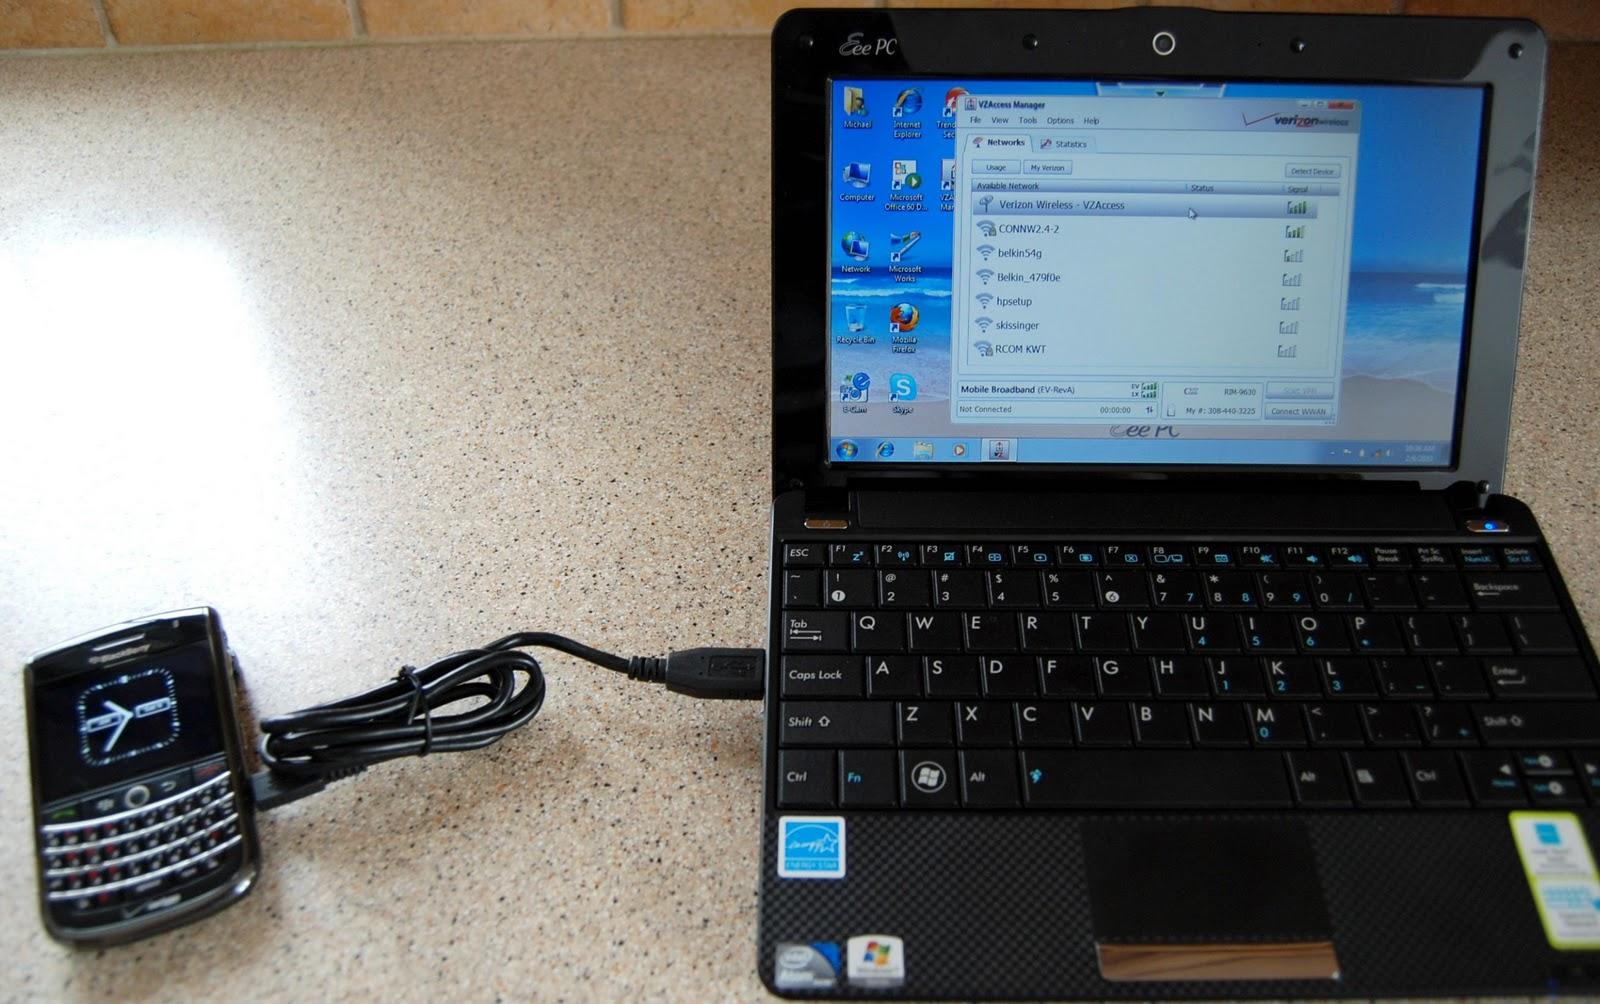 http://1.bp.blogspot.com/_A-NoeHCtVzA/TKDmq8CCNnI/AAAAAAAABGk/hqwJQMx9LaI/s1600/tether-blackberry.jpg